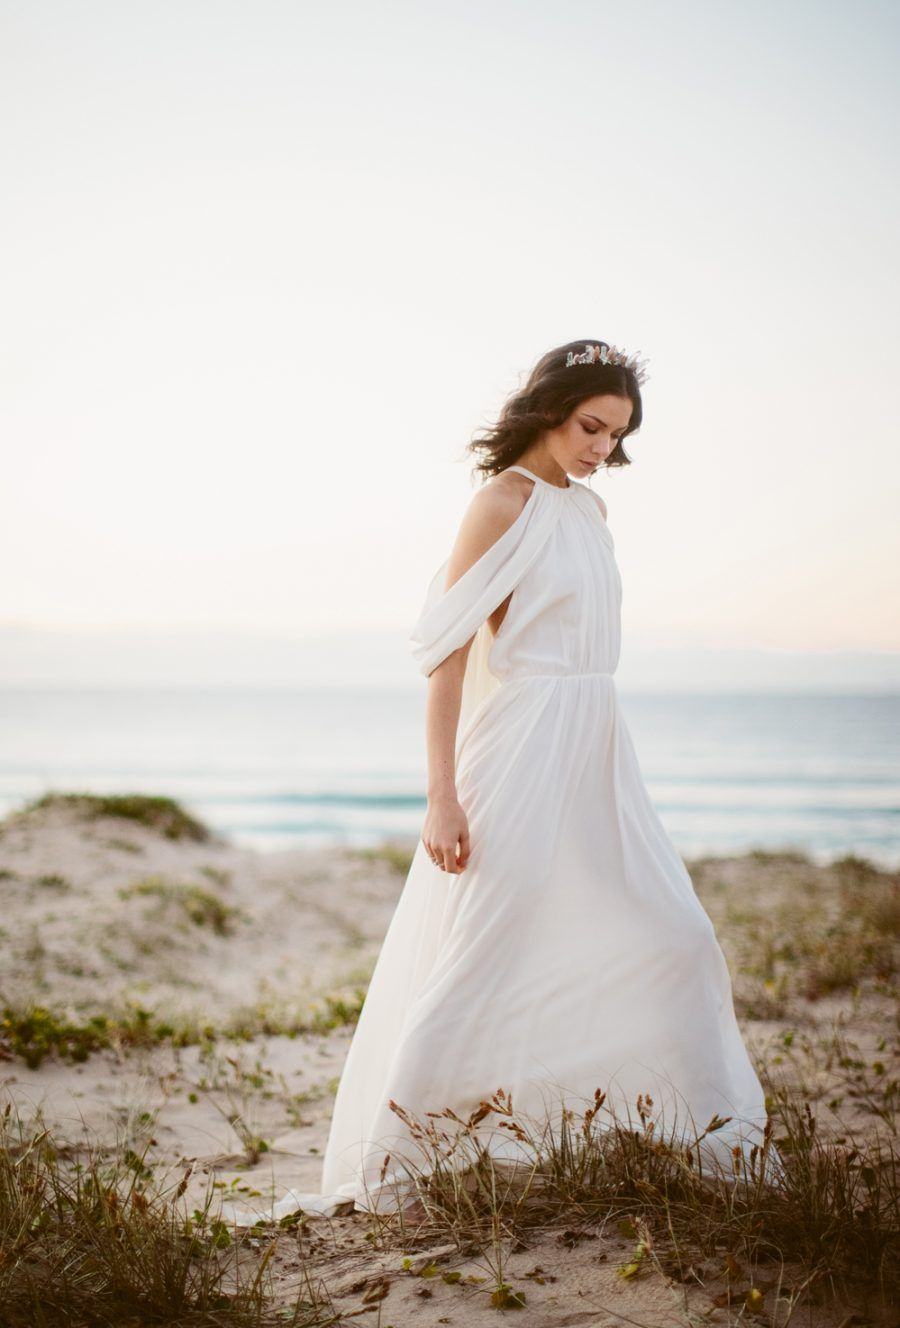 Ethereal wedding dress  Modern Ethereal Bridal Editorial  wedding dresses  Pinterest